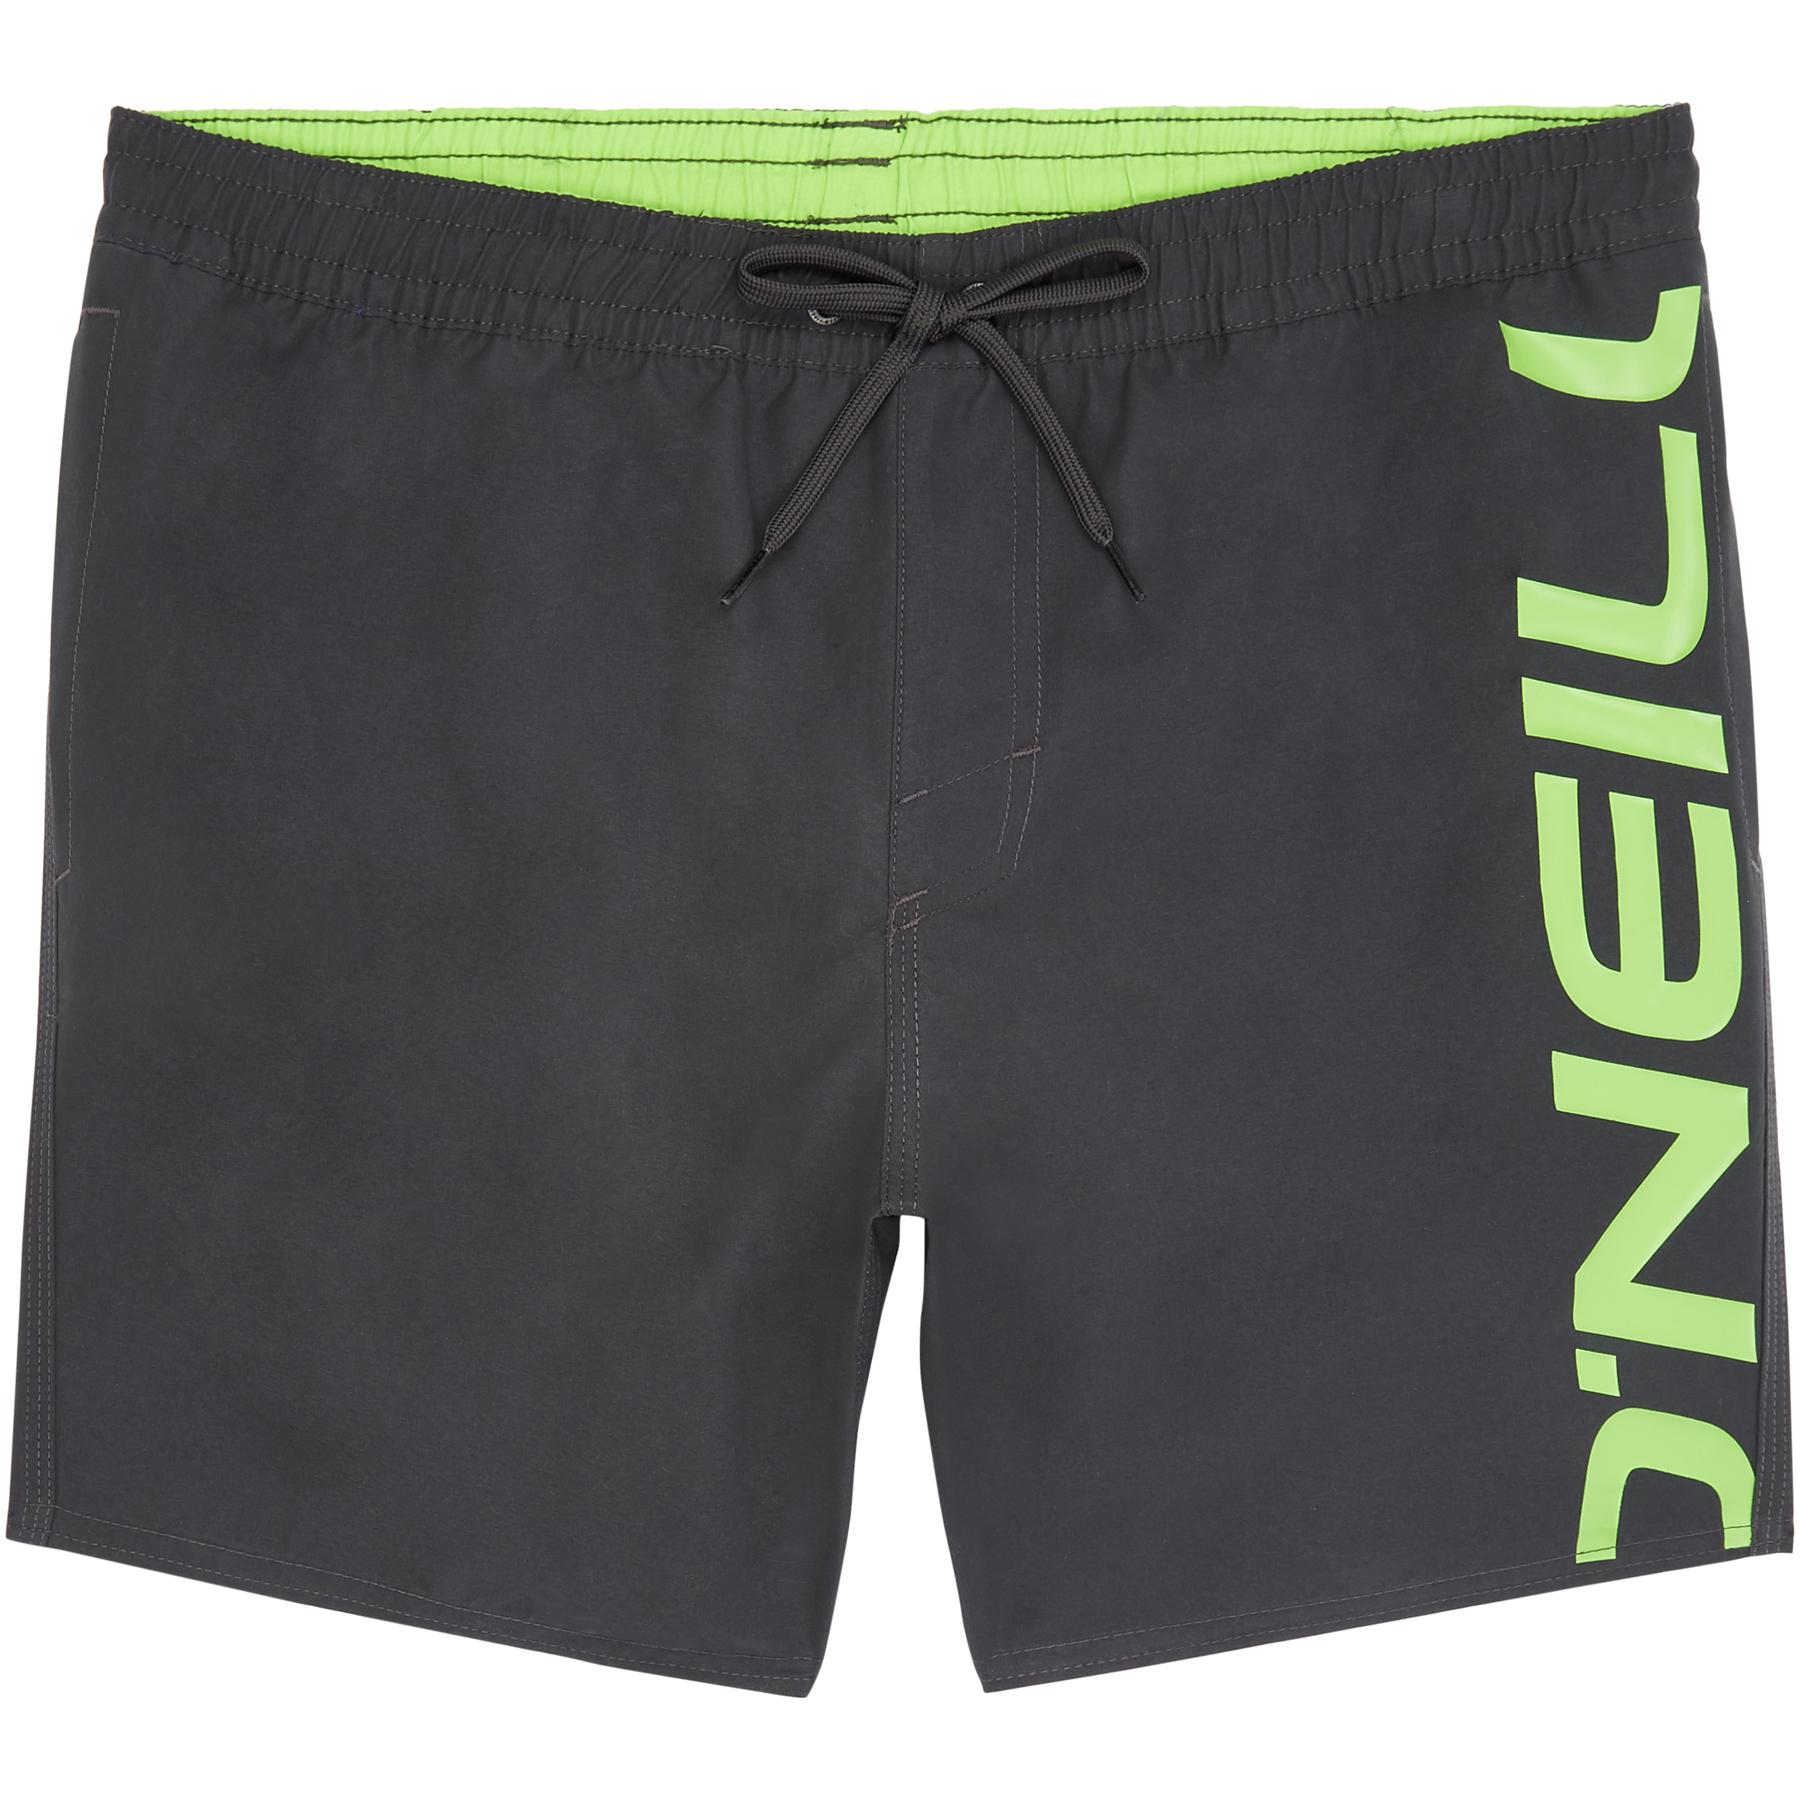 Шорты O'Neill шорты мужские o neill pm cali shorts цвет темно серый 9a3226 8026 размер s 46 48